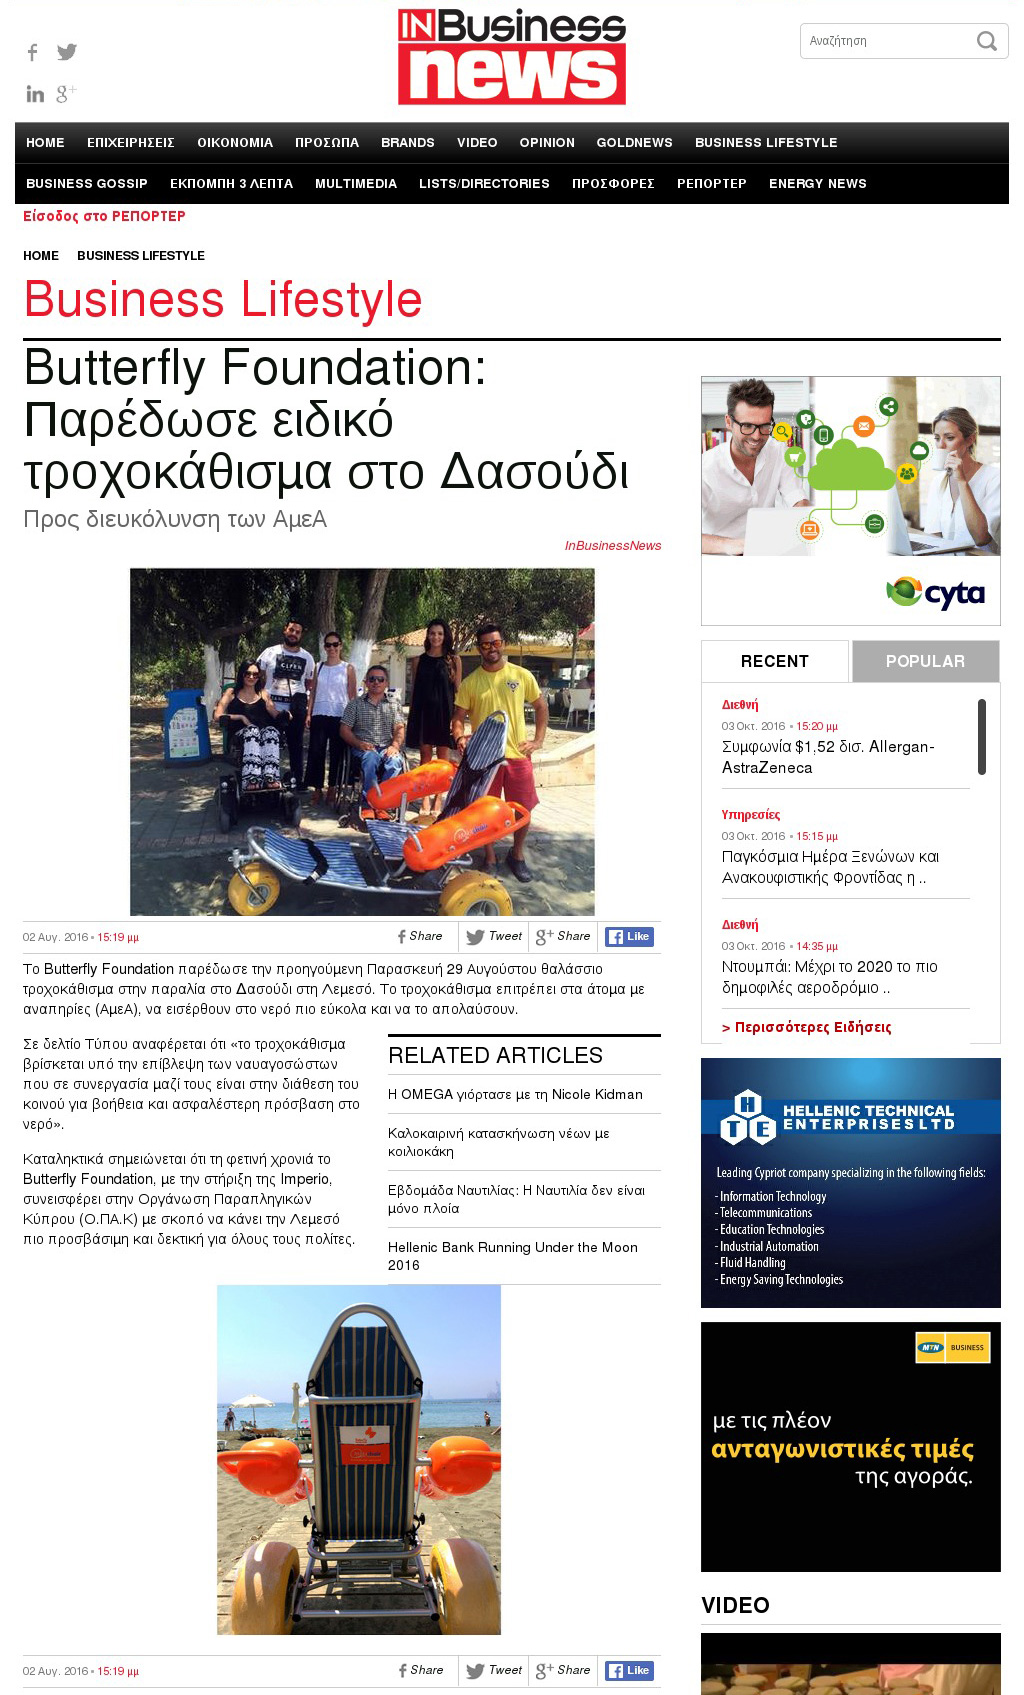 Butterfly Foundation: Παρέδωσε ειδικό τροχοκάθισμα στο Δασούδι